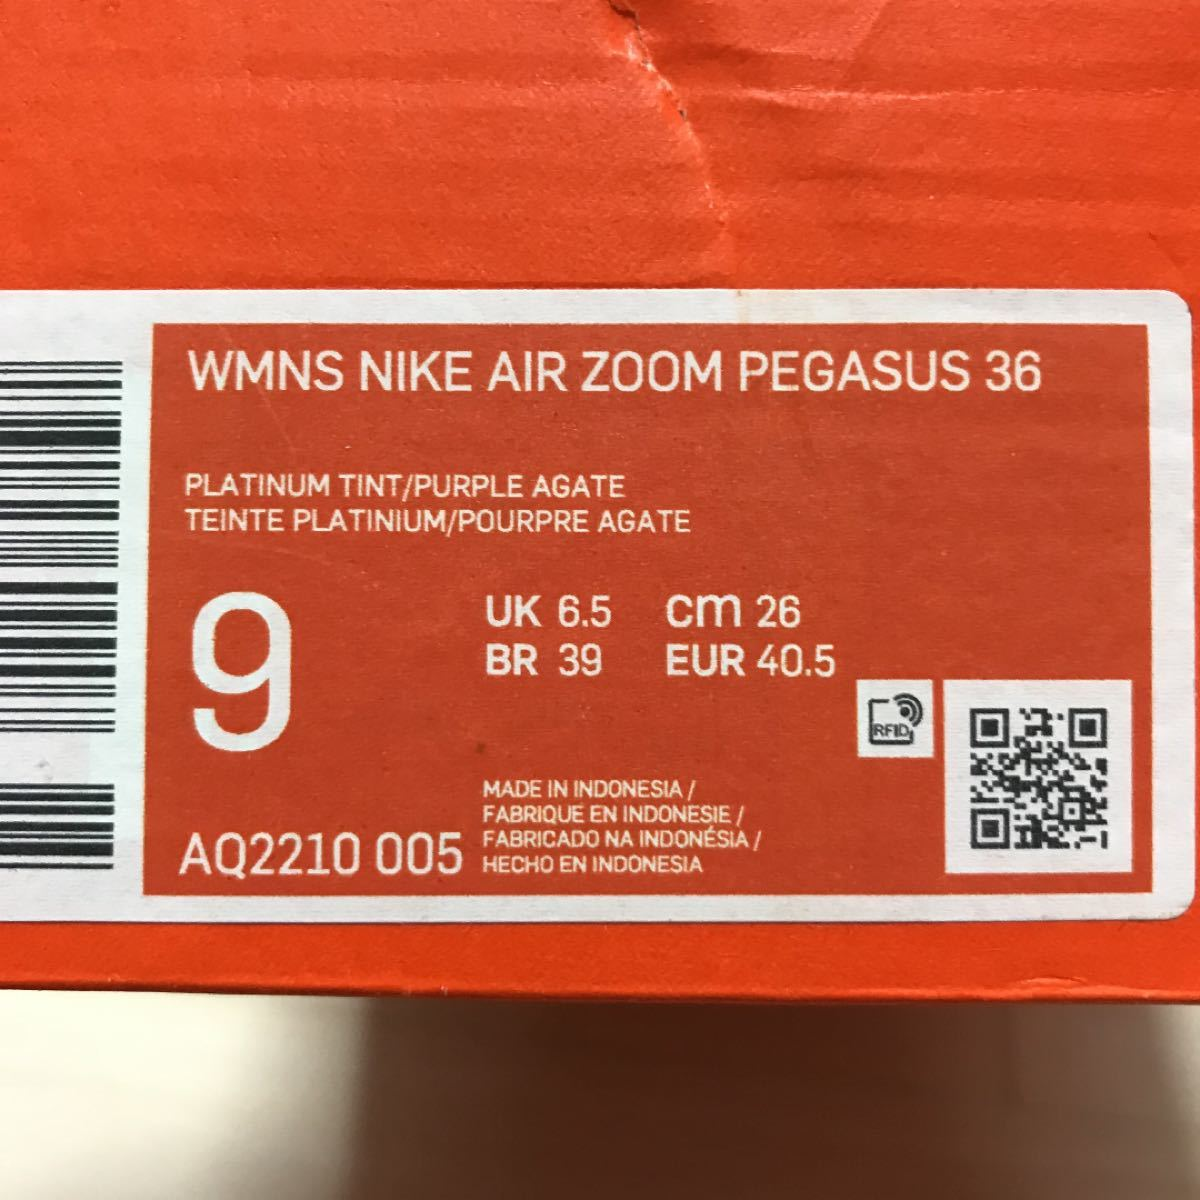 WMNS NIKE AIR ZOOM PEGASUS 36 ウィメンズ  ナイキ エア ズーム ペガサス 36